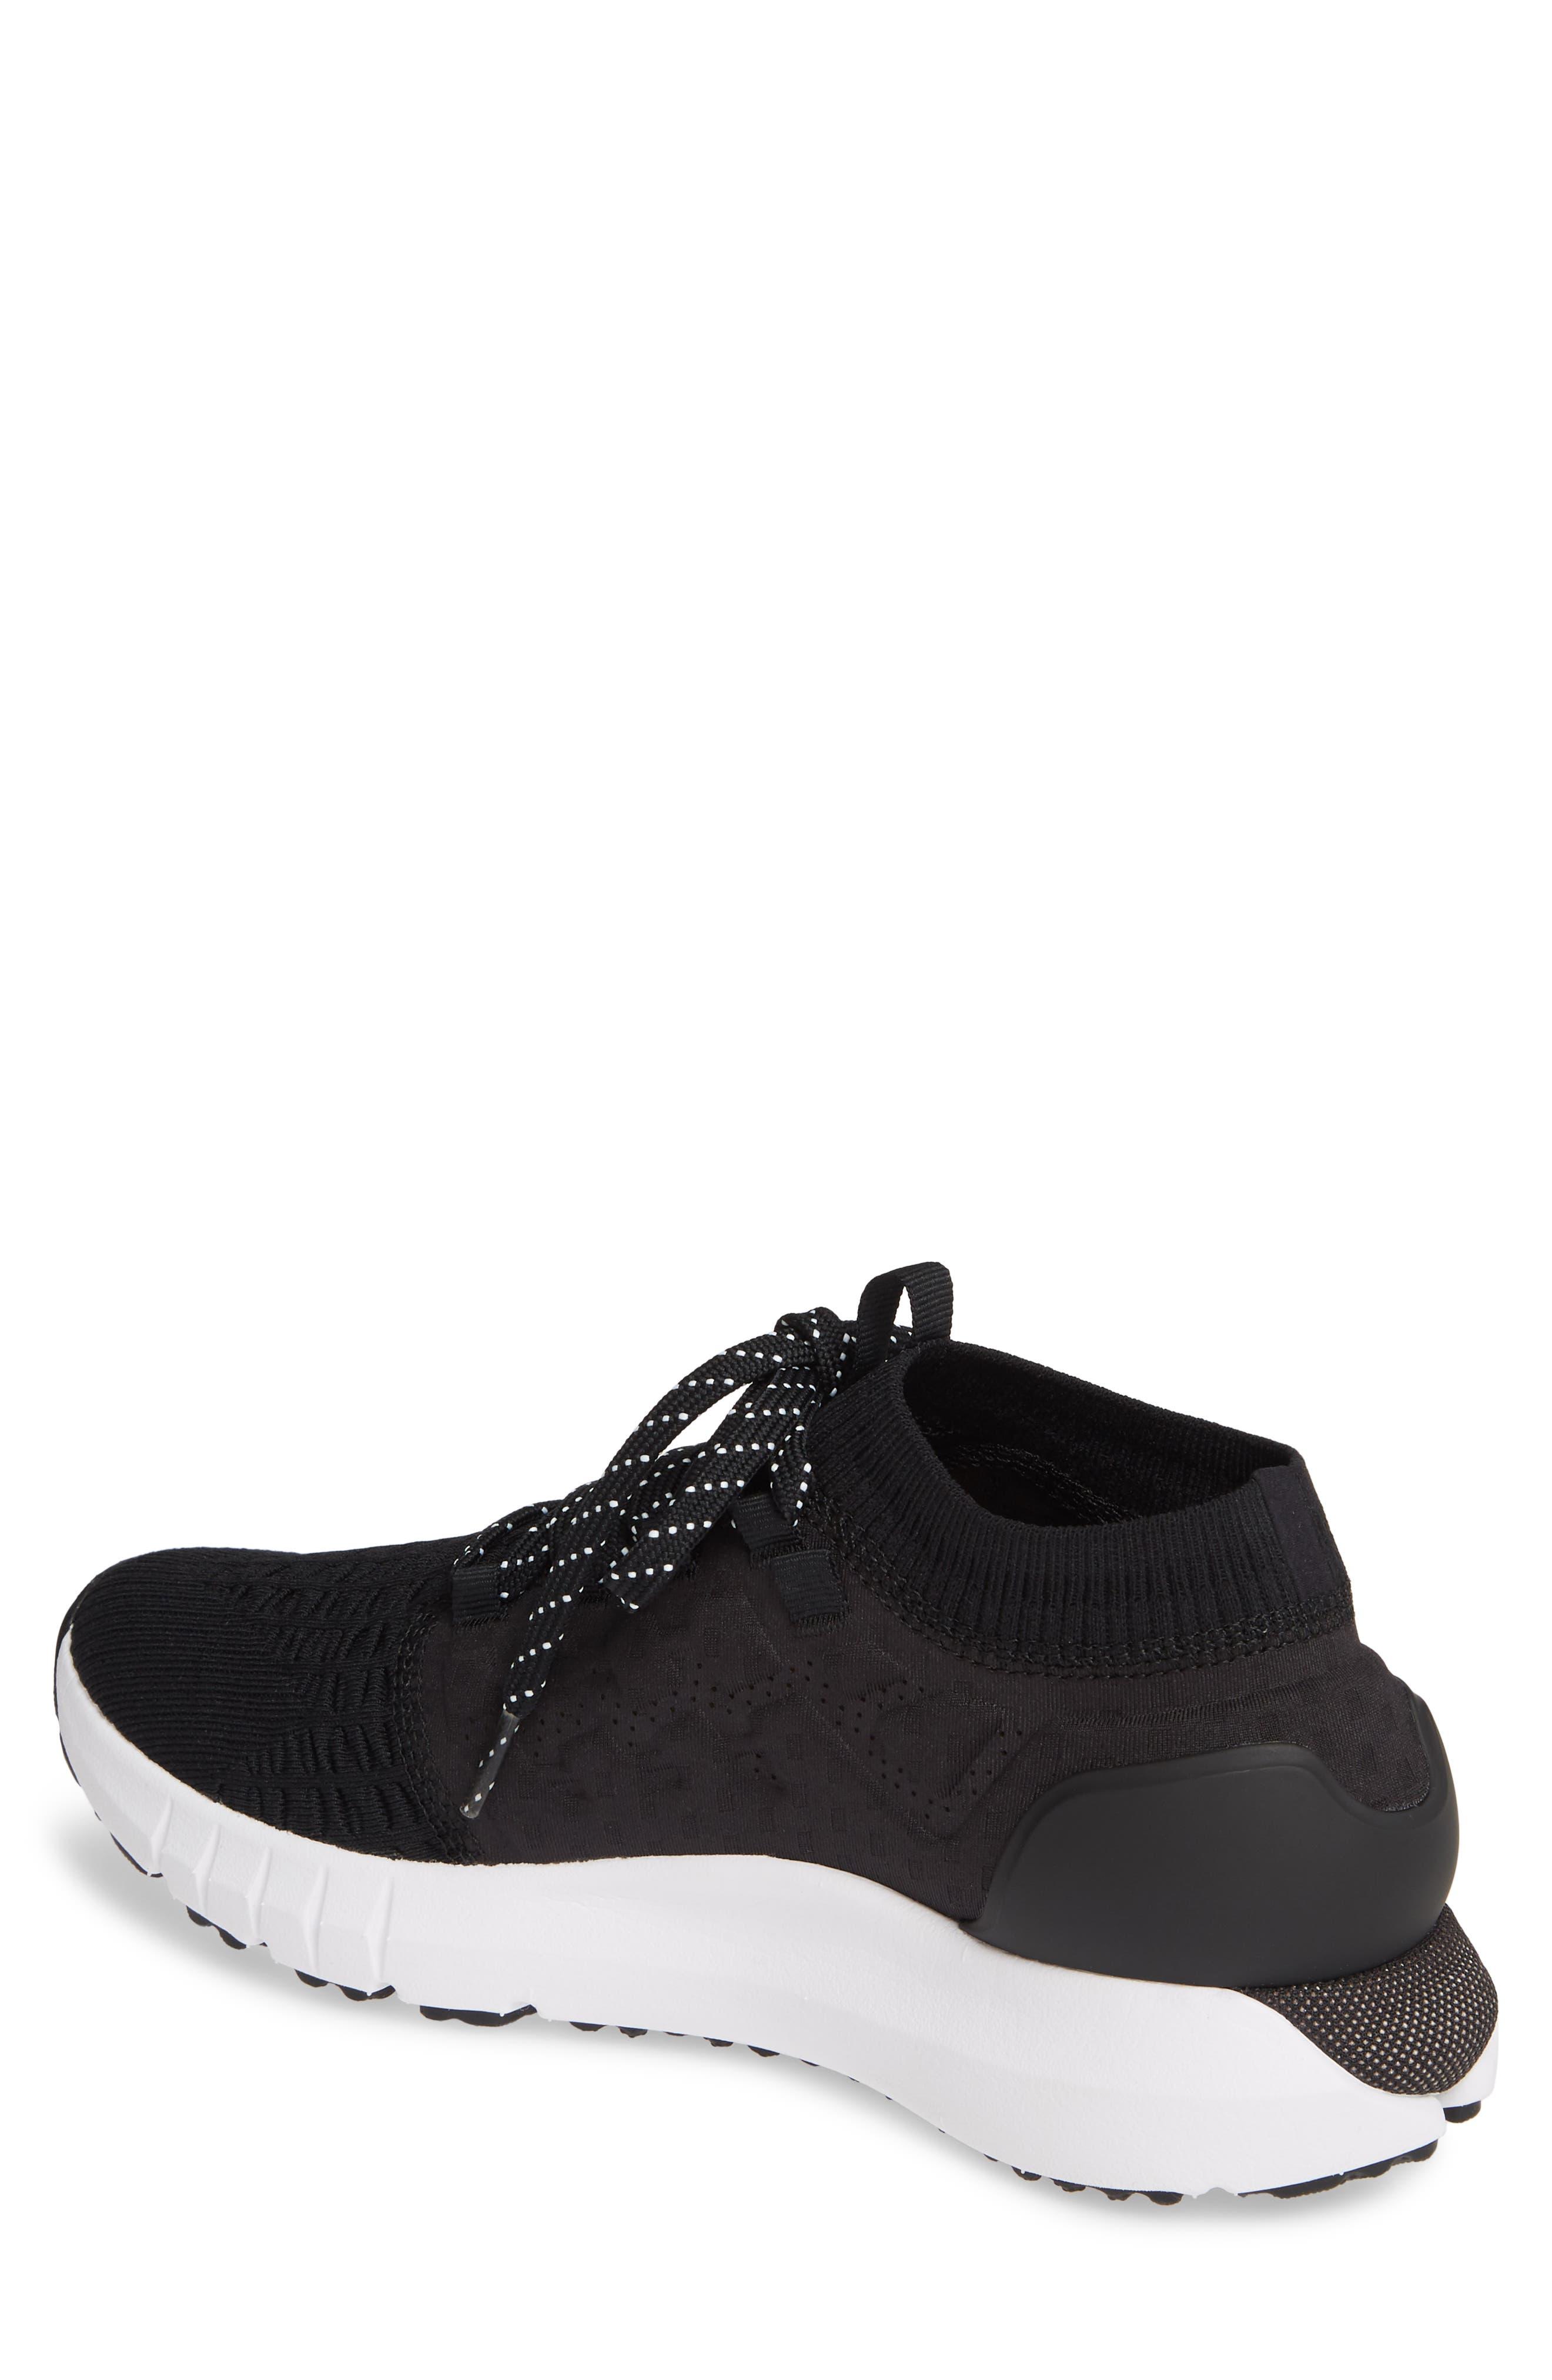 newest c42fc d29f0 Mens Sock Sneaker Sneakers, Athletic  Running Shoes  Nordstr